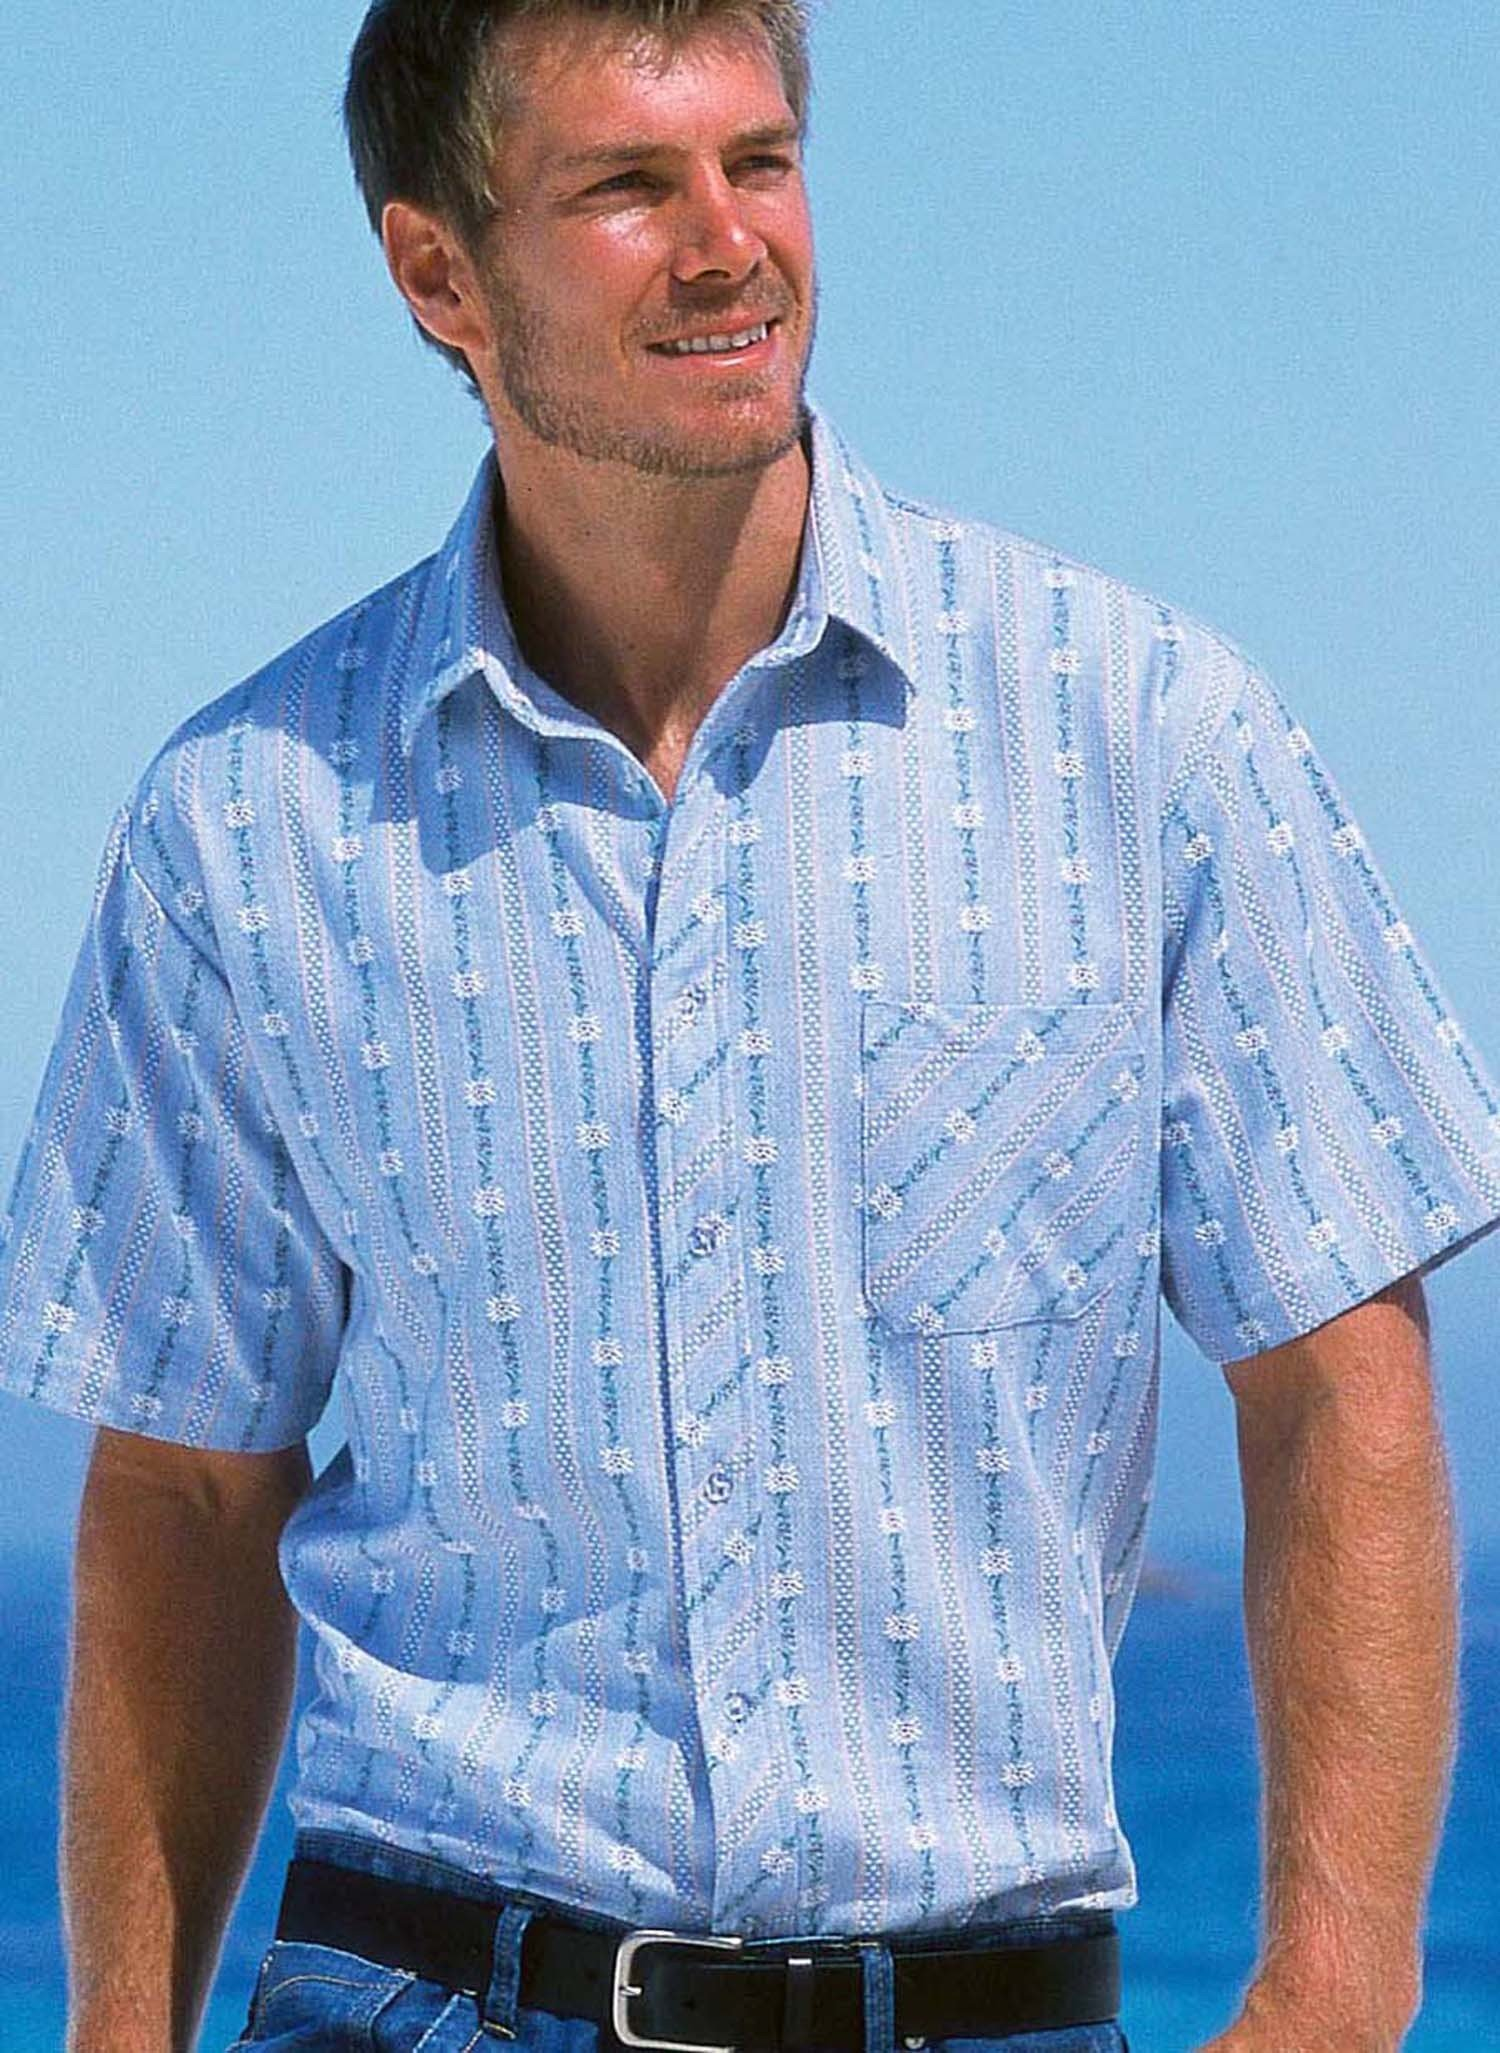 H-KA-Edelweiss Hemd, h.blau 3738 162